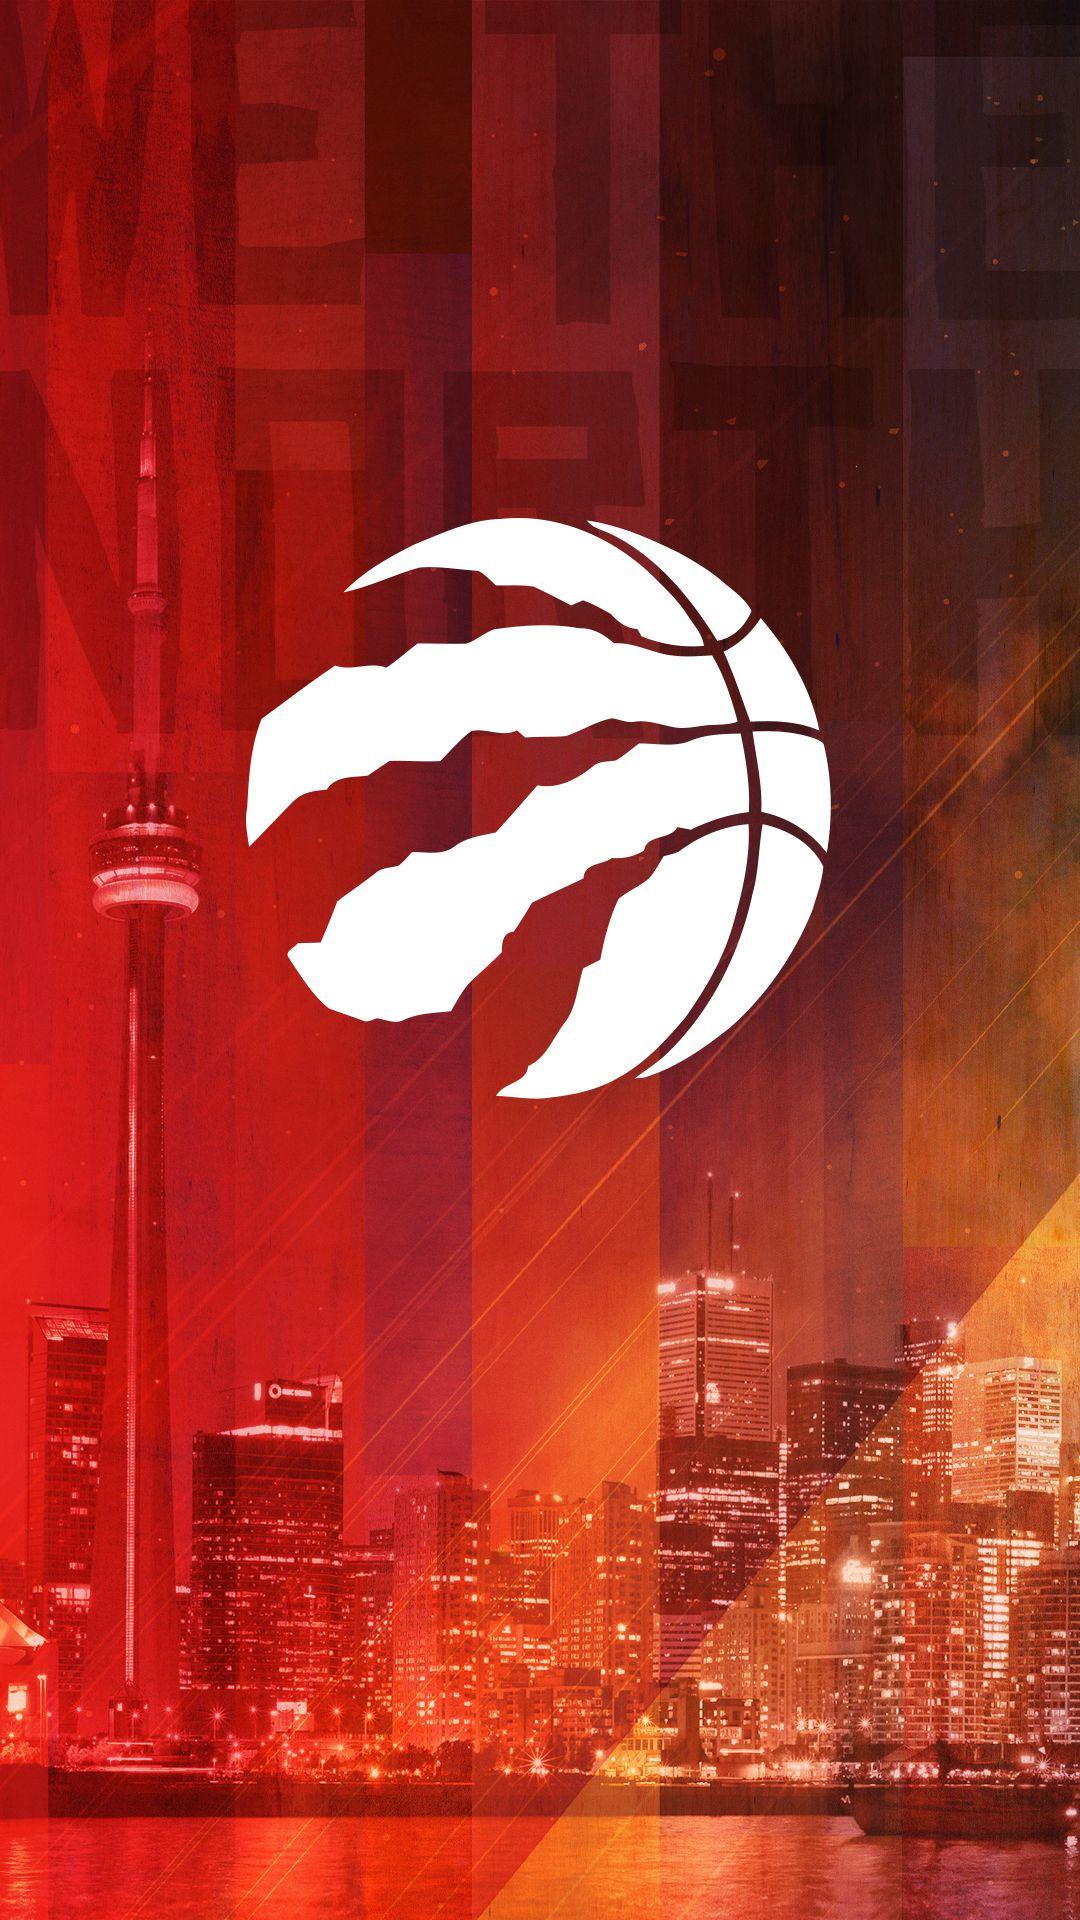 Toronto Raptors Wallpaper - Mobile (New Logo) - Imgur  c52d37e37